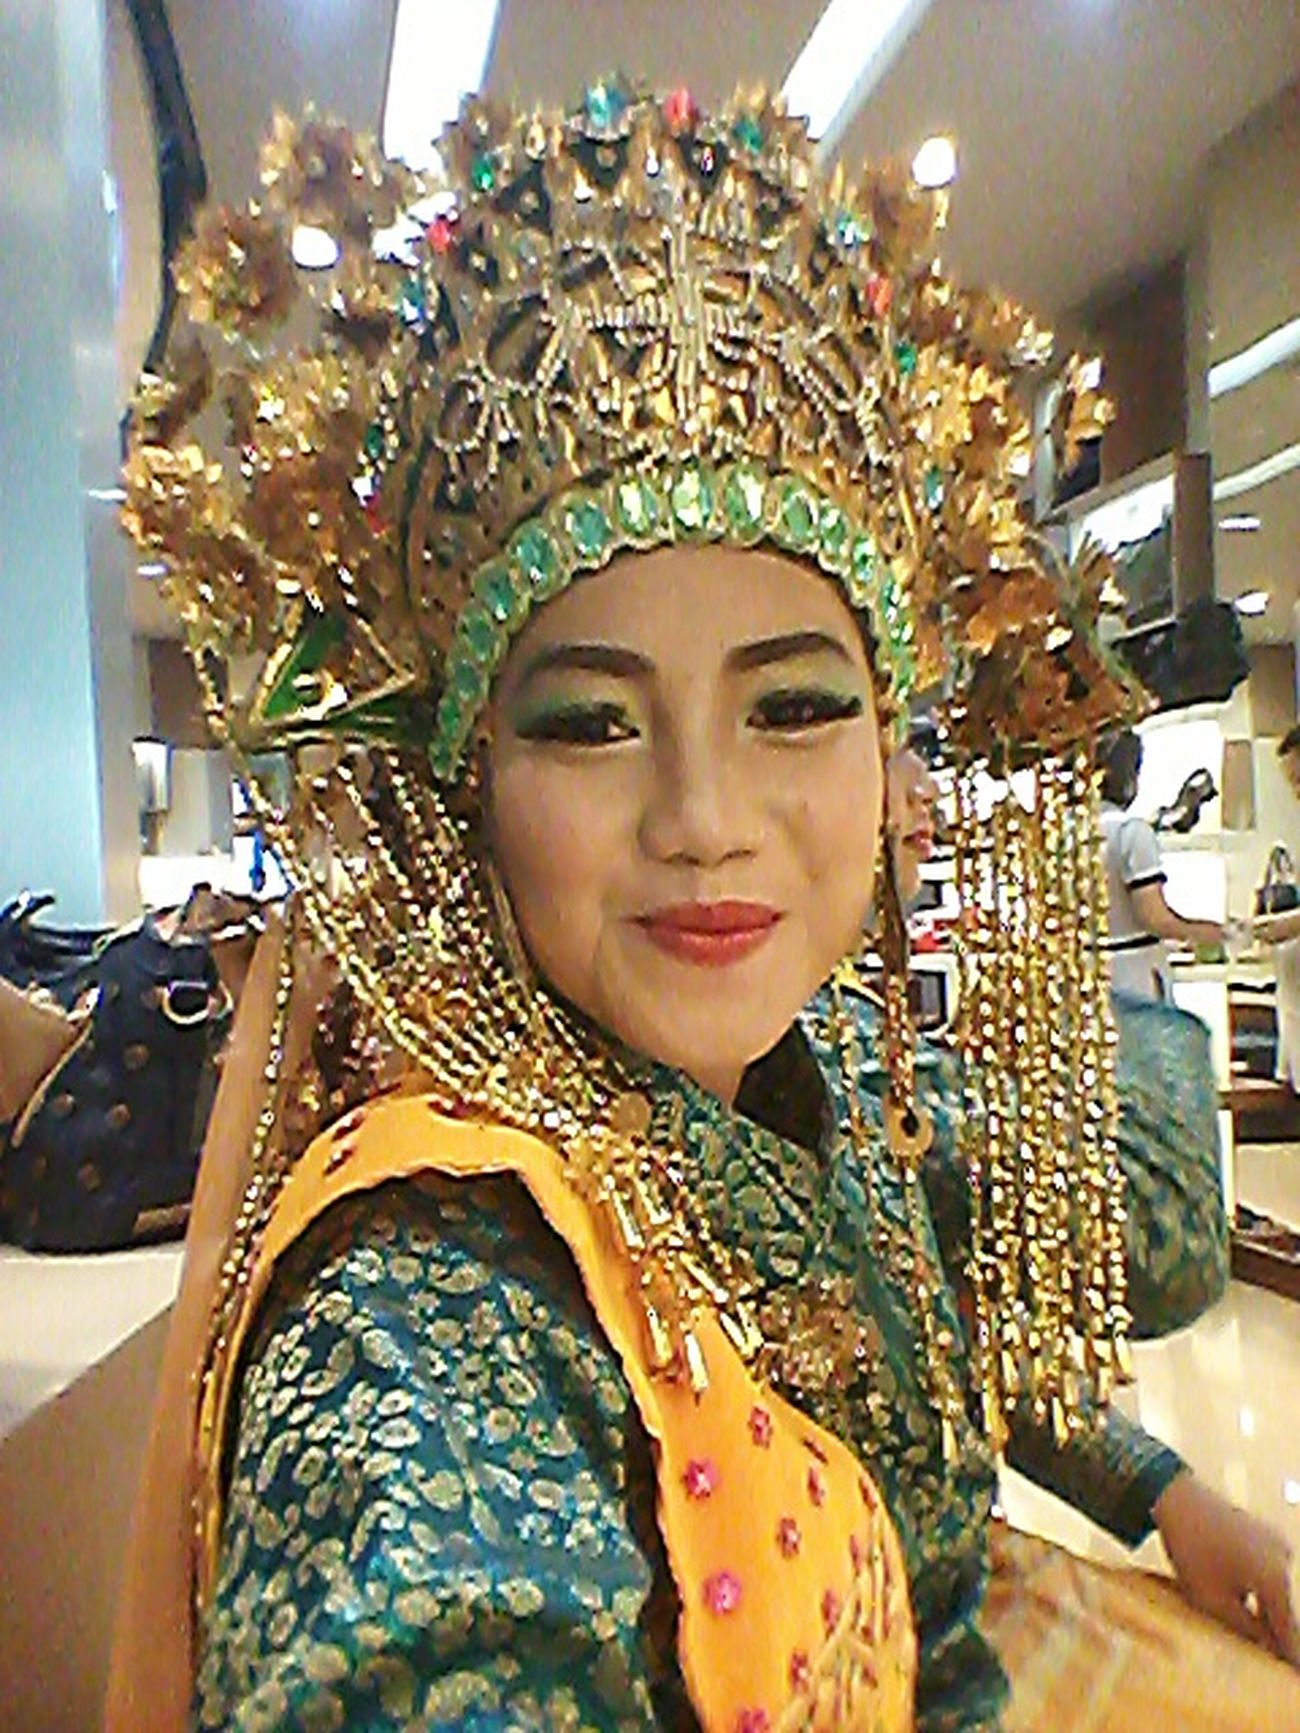 Tradisional Dance Etnic Riau Melayu Sunting Melayu Exploreriau EksploreIndonesia Color Portrait Smile Girl Iloveindonesia